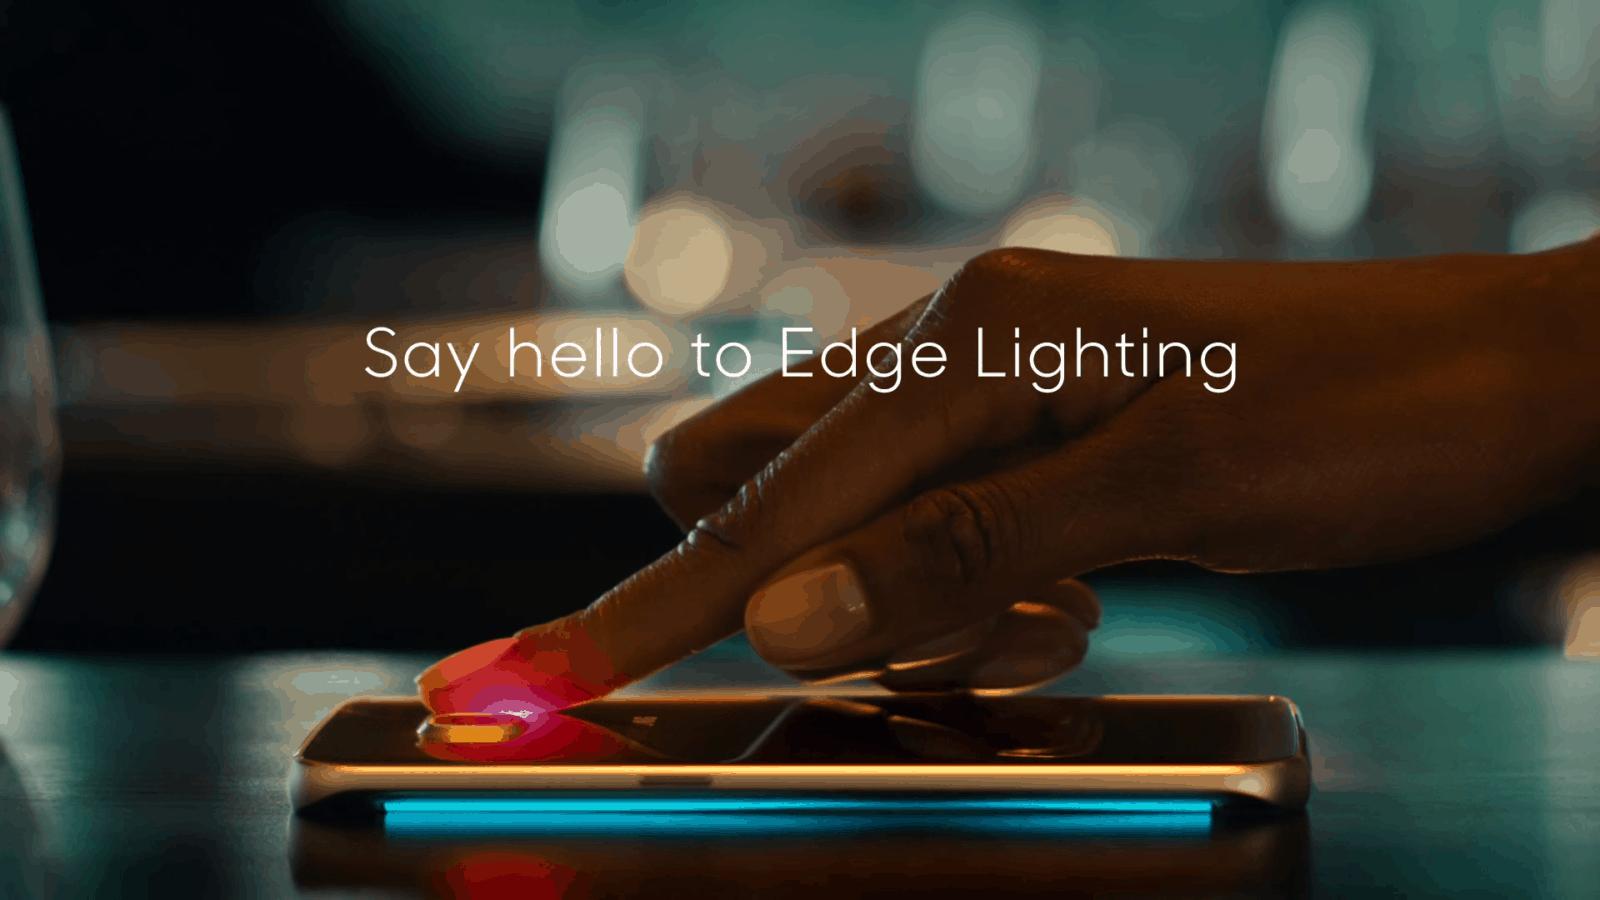 Edge Lighting Galaxy S6 Edge Ad